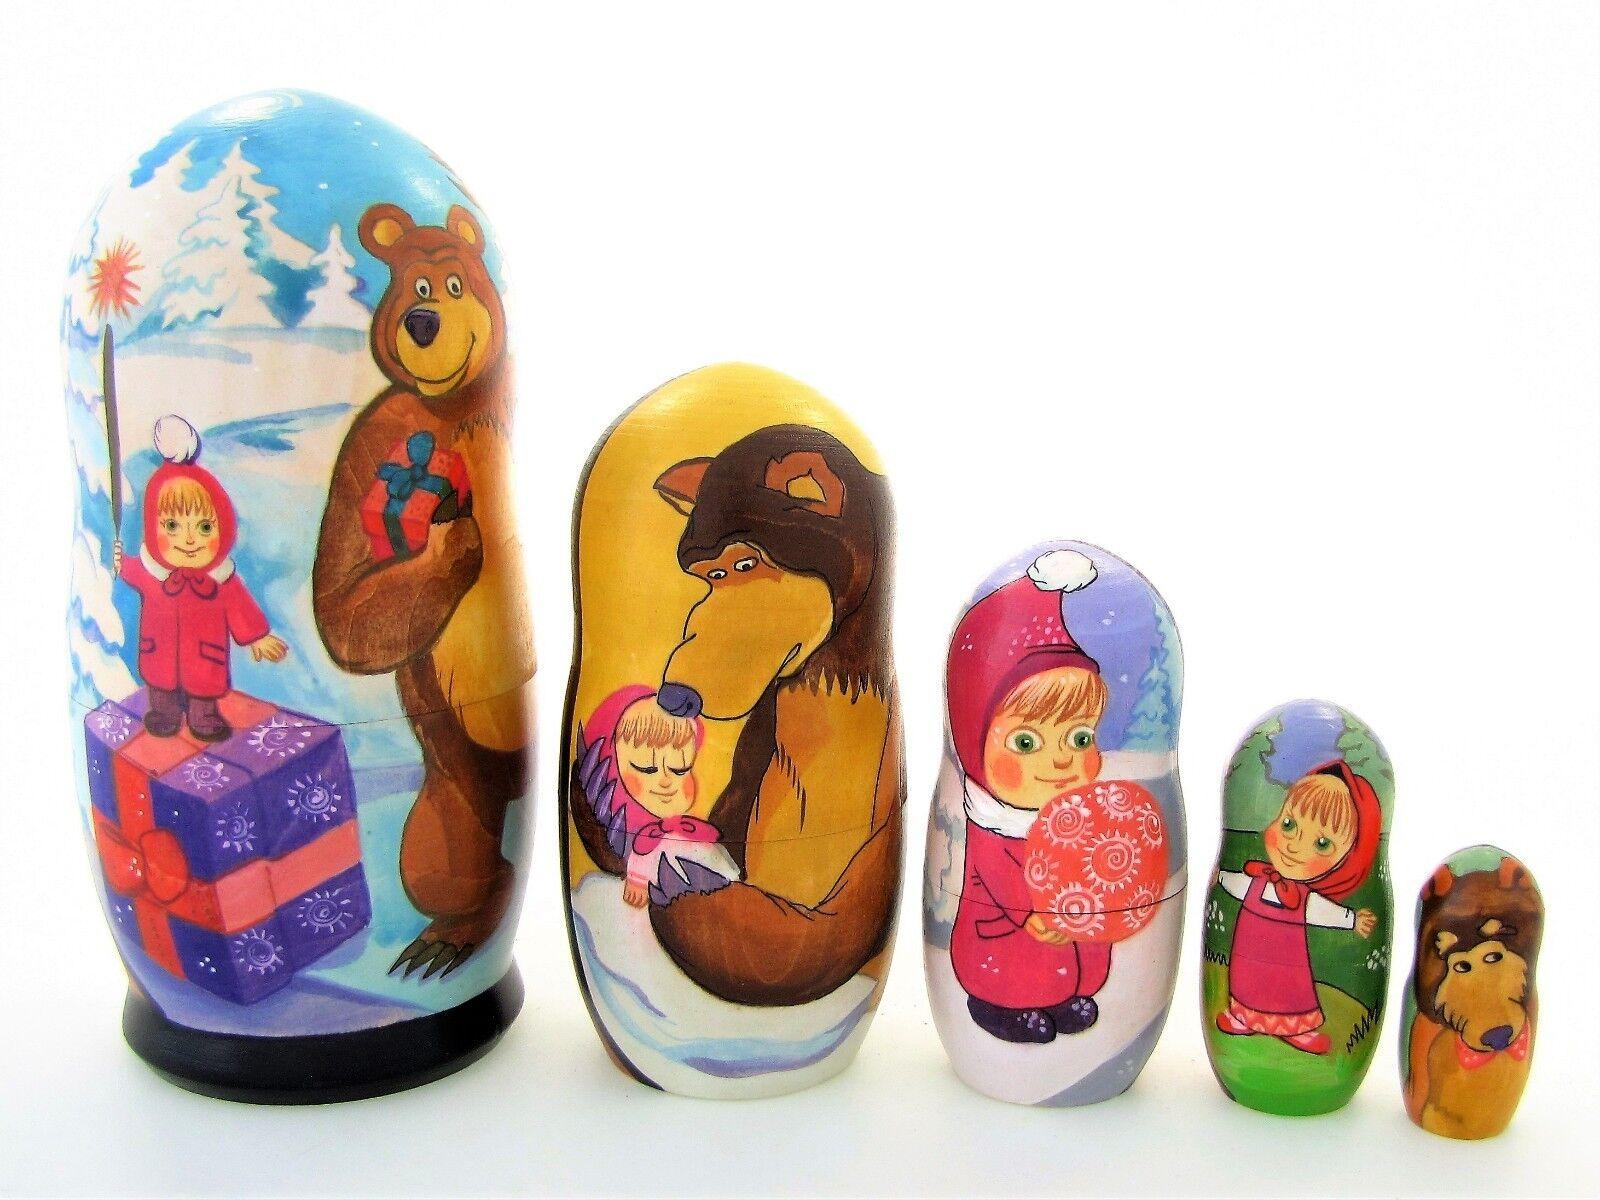 Poupées russes H18 peint main signé Matriochka Gigogne Russian Doll Matrjoschka